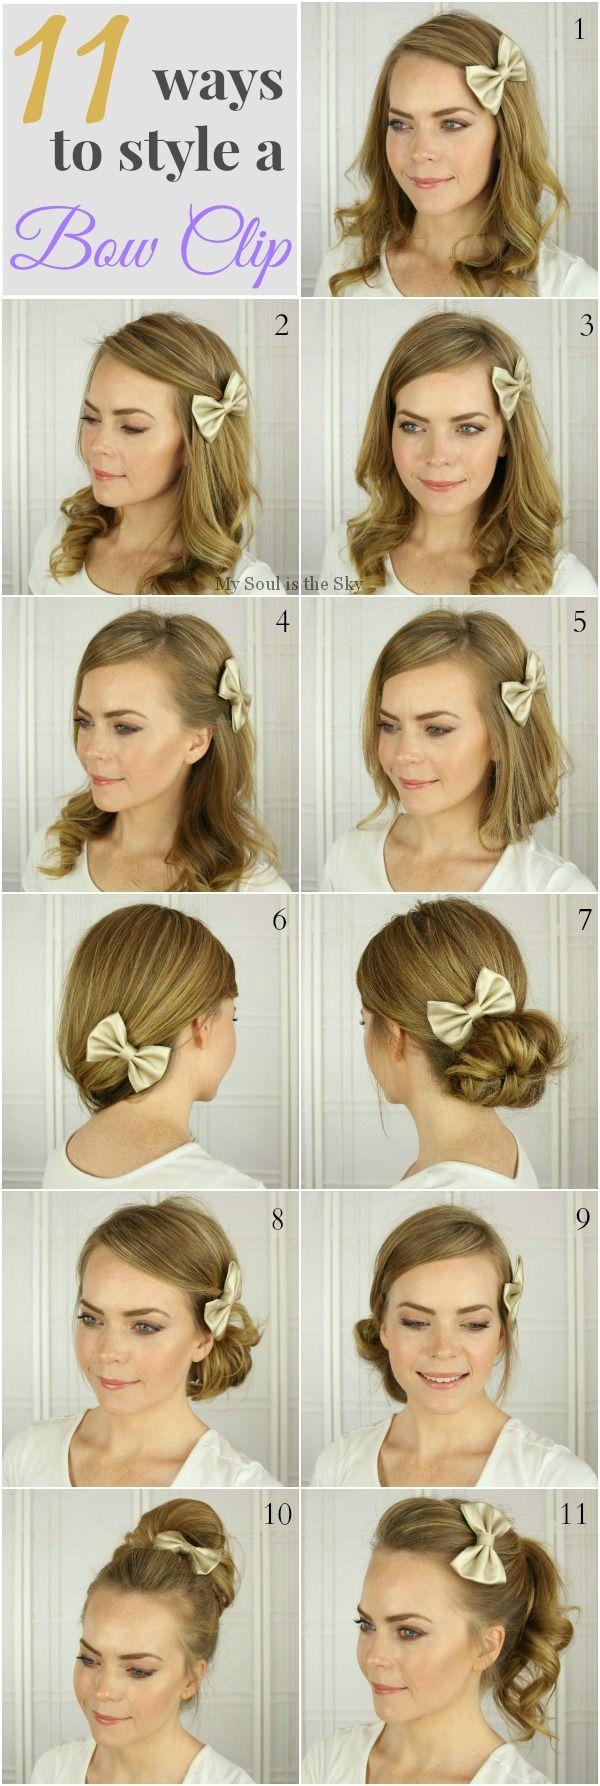 Amazing 1000 Ideas About Bow Bun Tutorials On Pinterest Bow Buns Hair Short Hairstyles Gunalazisus